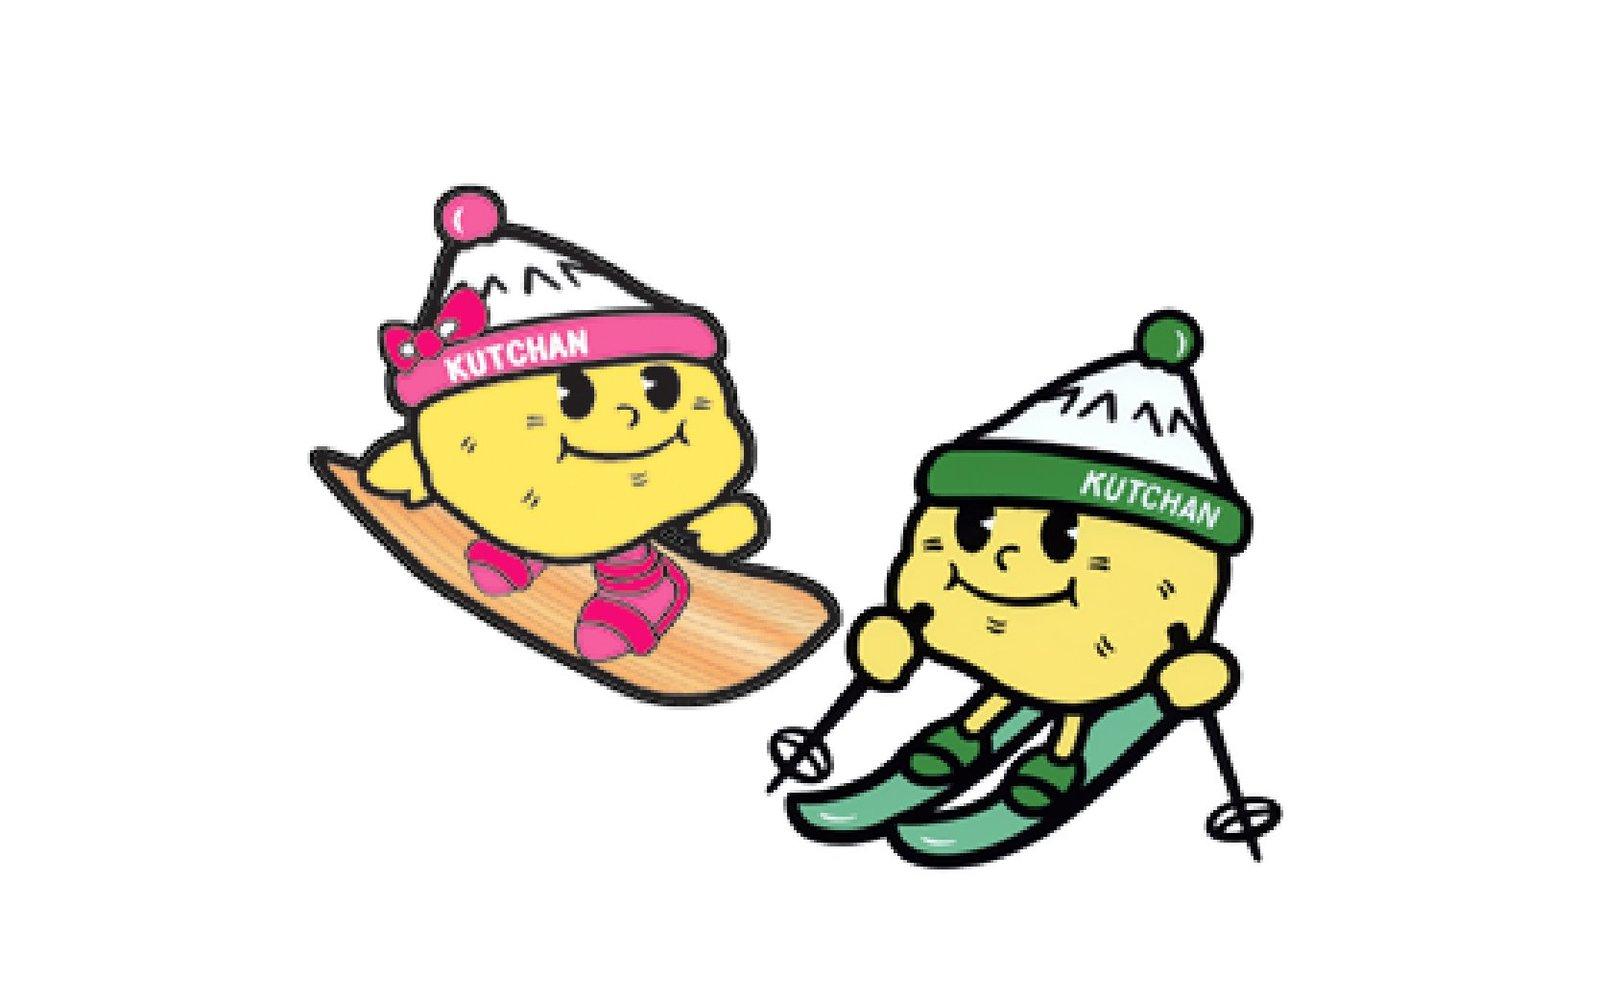 jagako chan and jagata kun, the mascots of kutchan